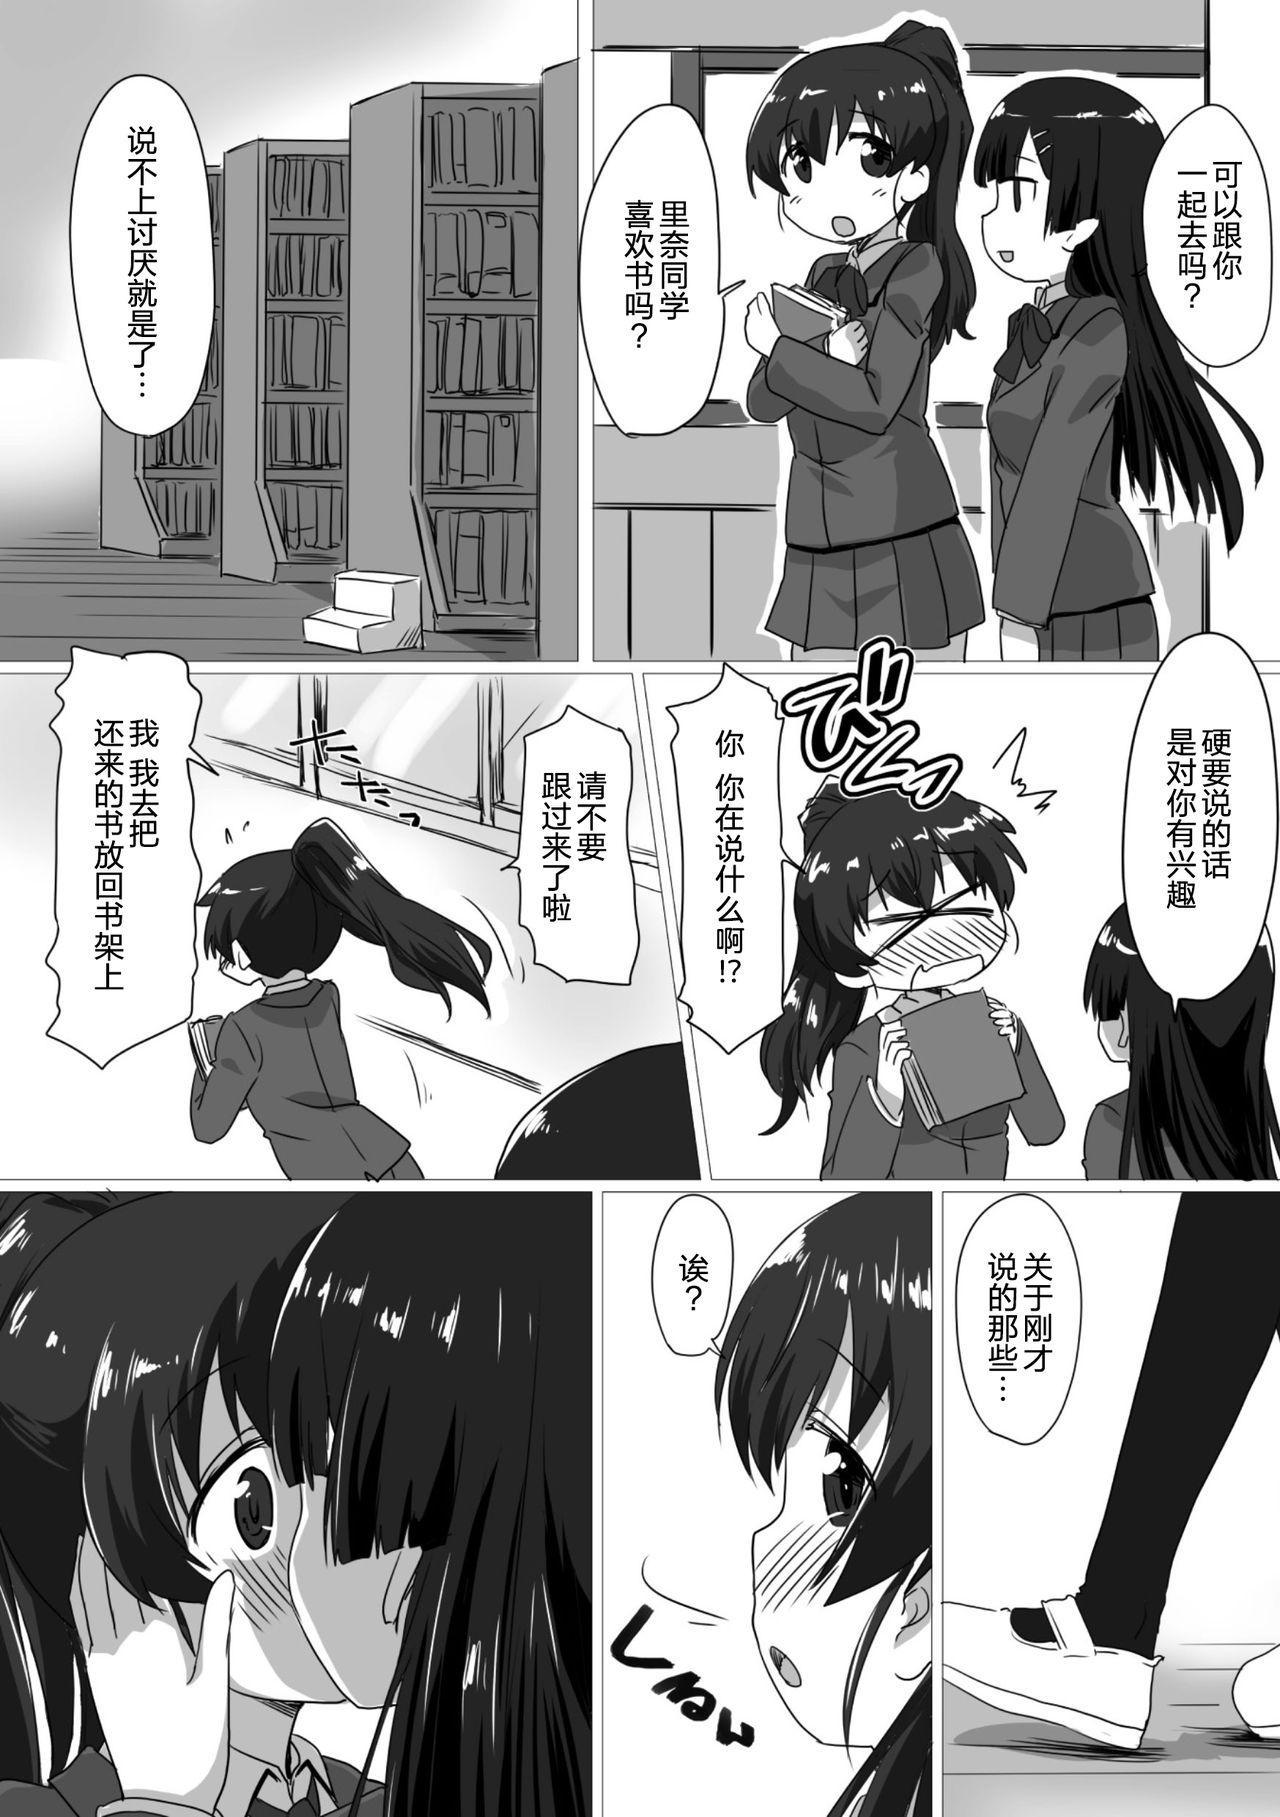 2D Comic Magazine Futanarikko no Tanetsuke Press de Kyousei Haramase! Vol. 2 24